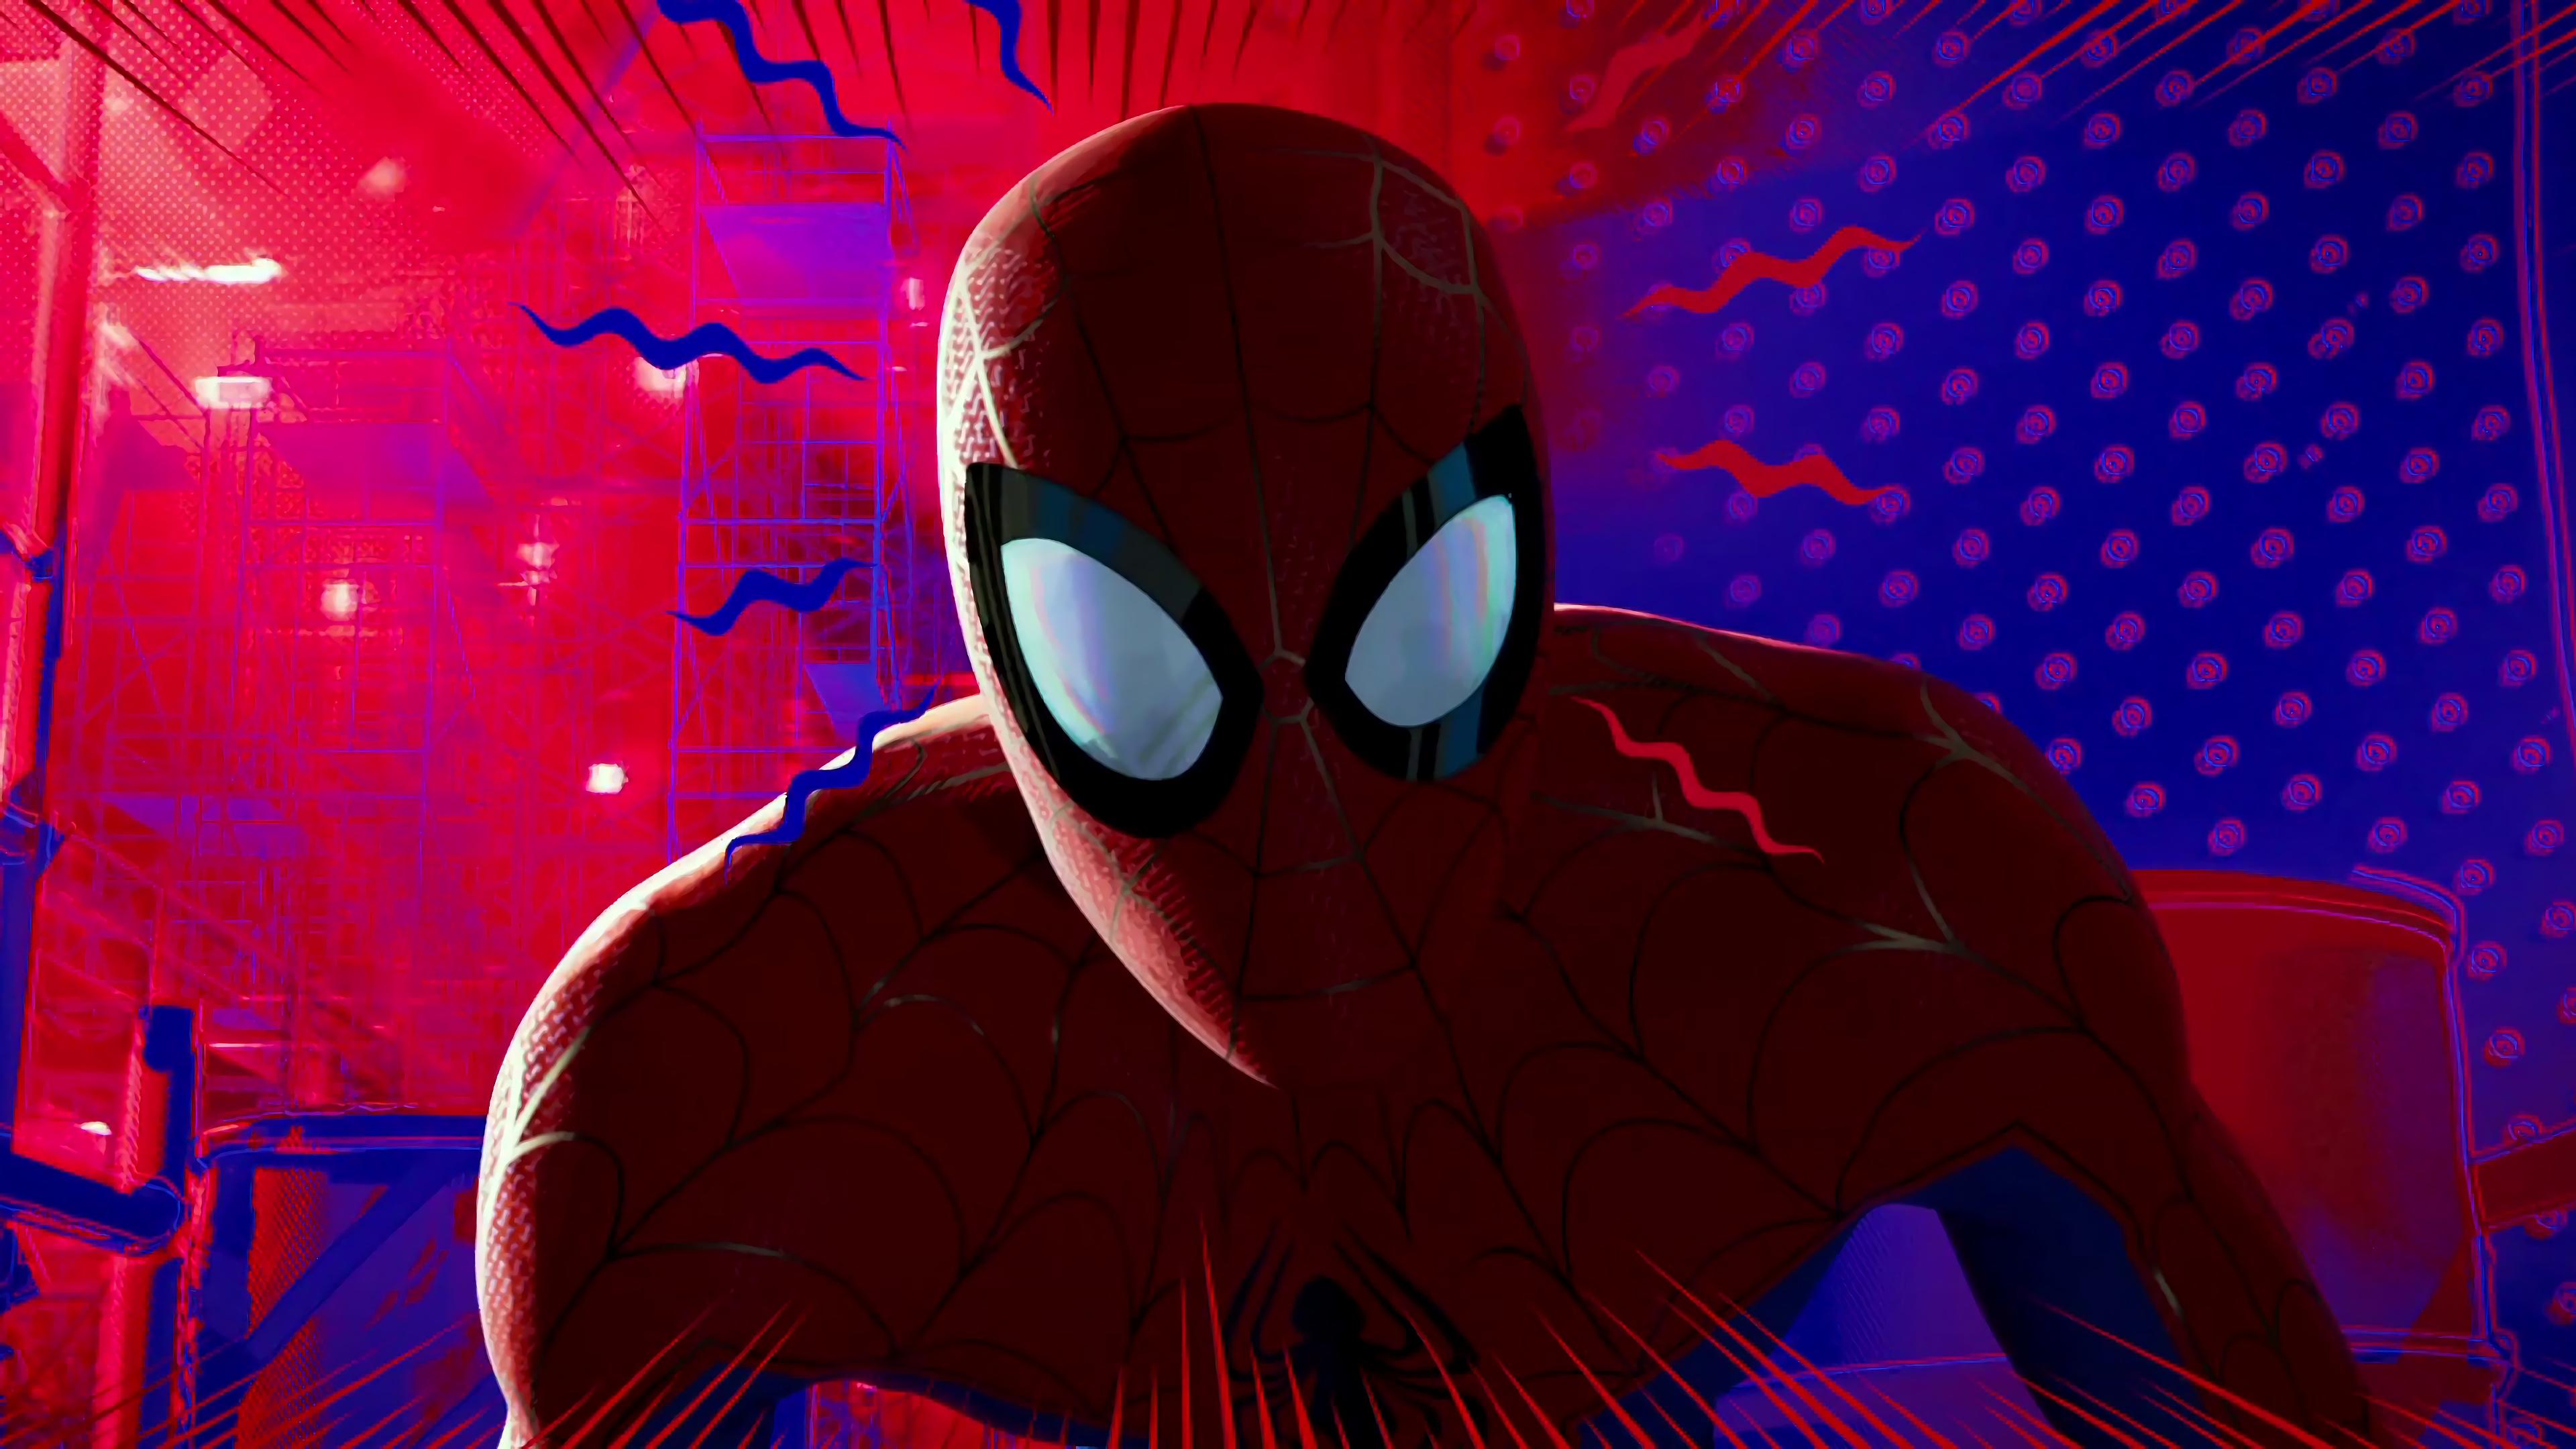 Le rendu visuel de Spider-Man: New Generation est impressionnant